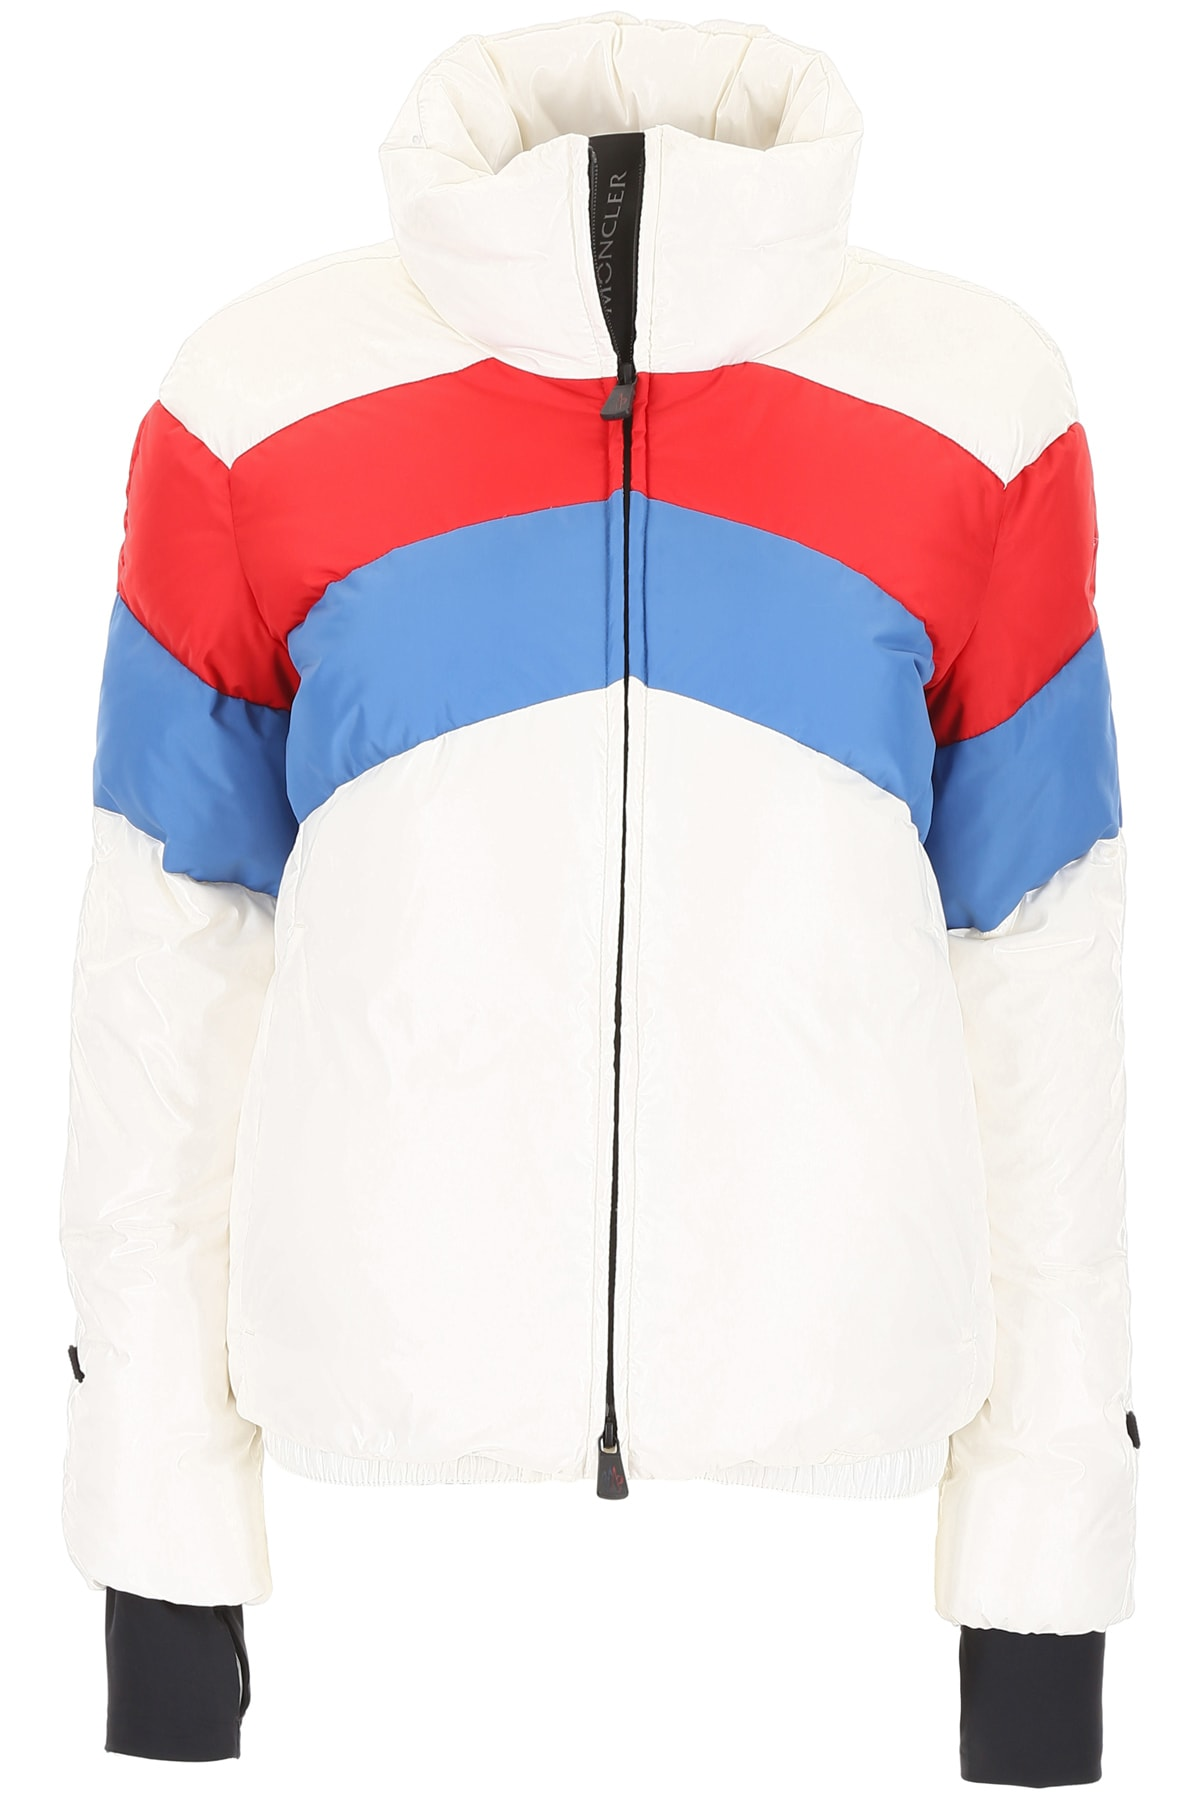 Moncler Grenoble Lamar Puffer Jacket